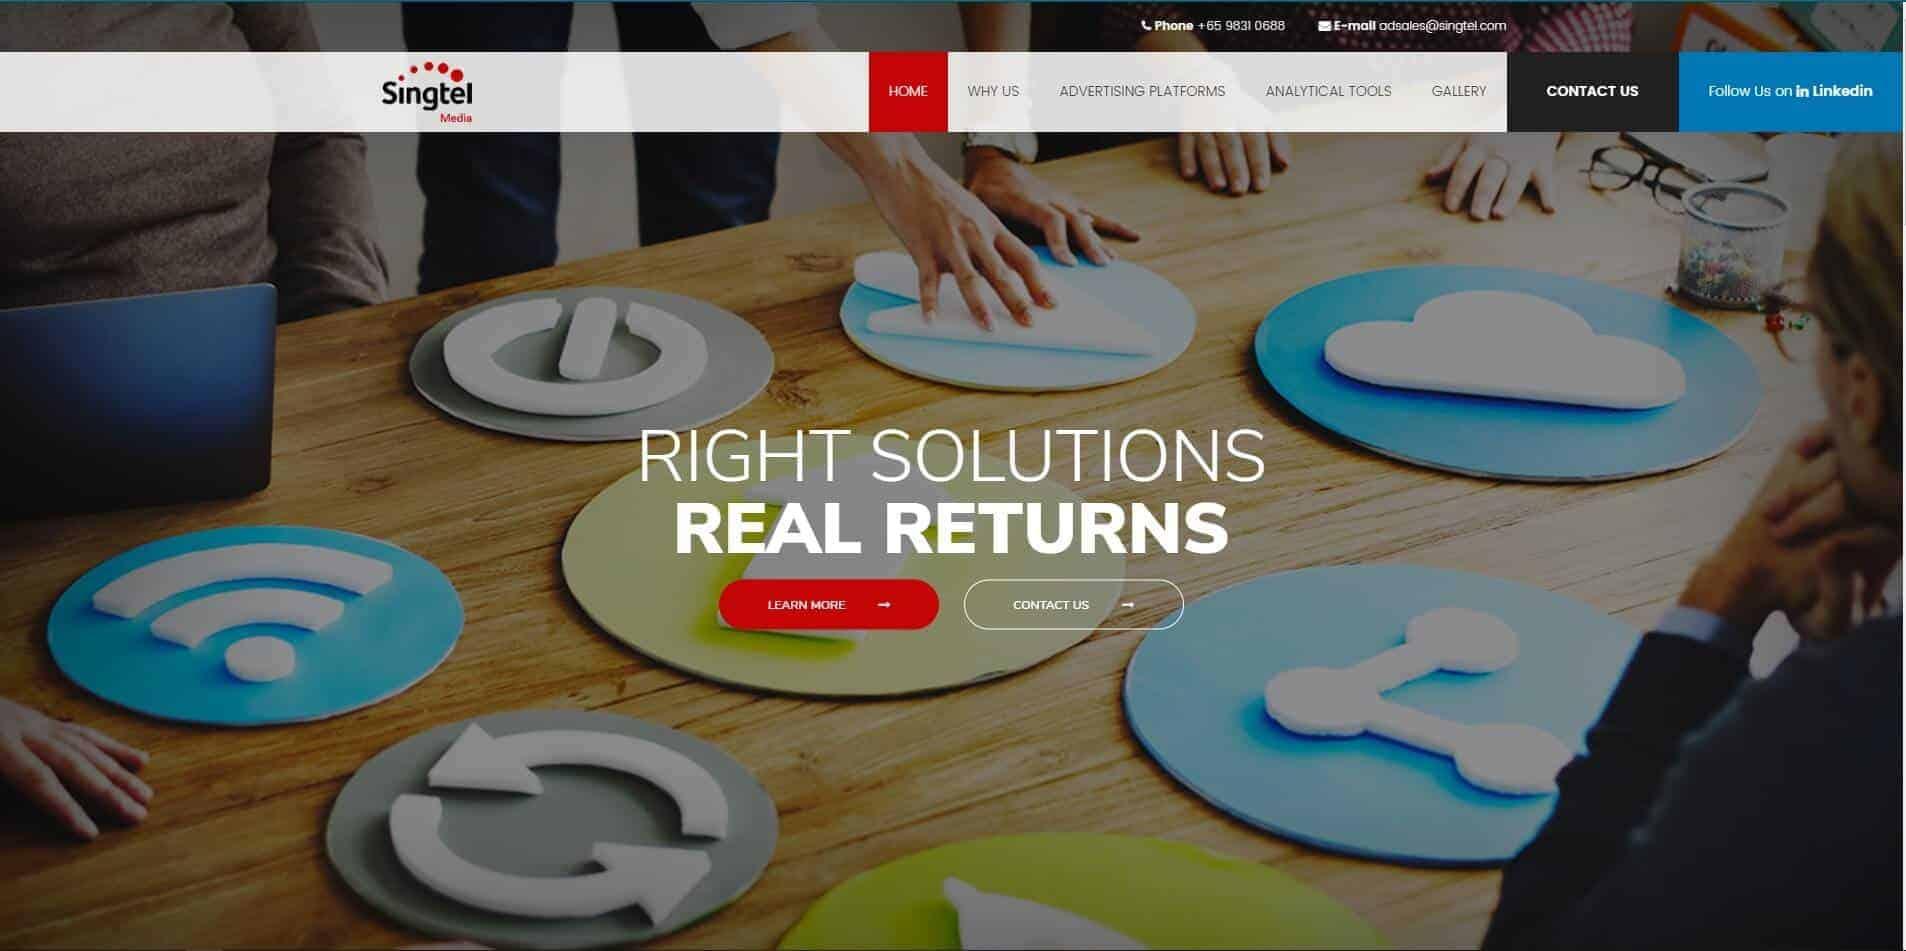 Website Design Services Singapore 127